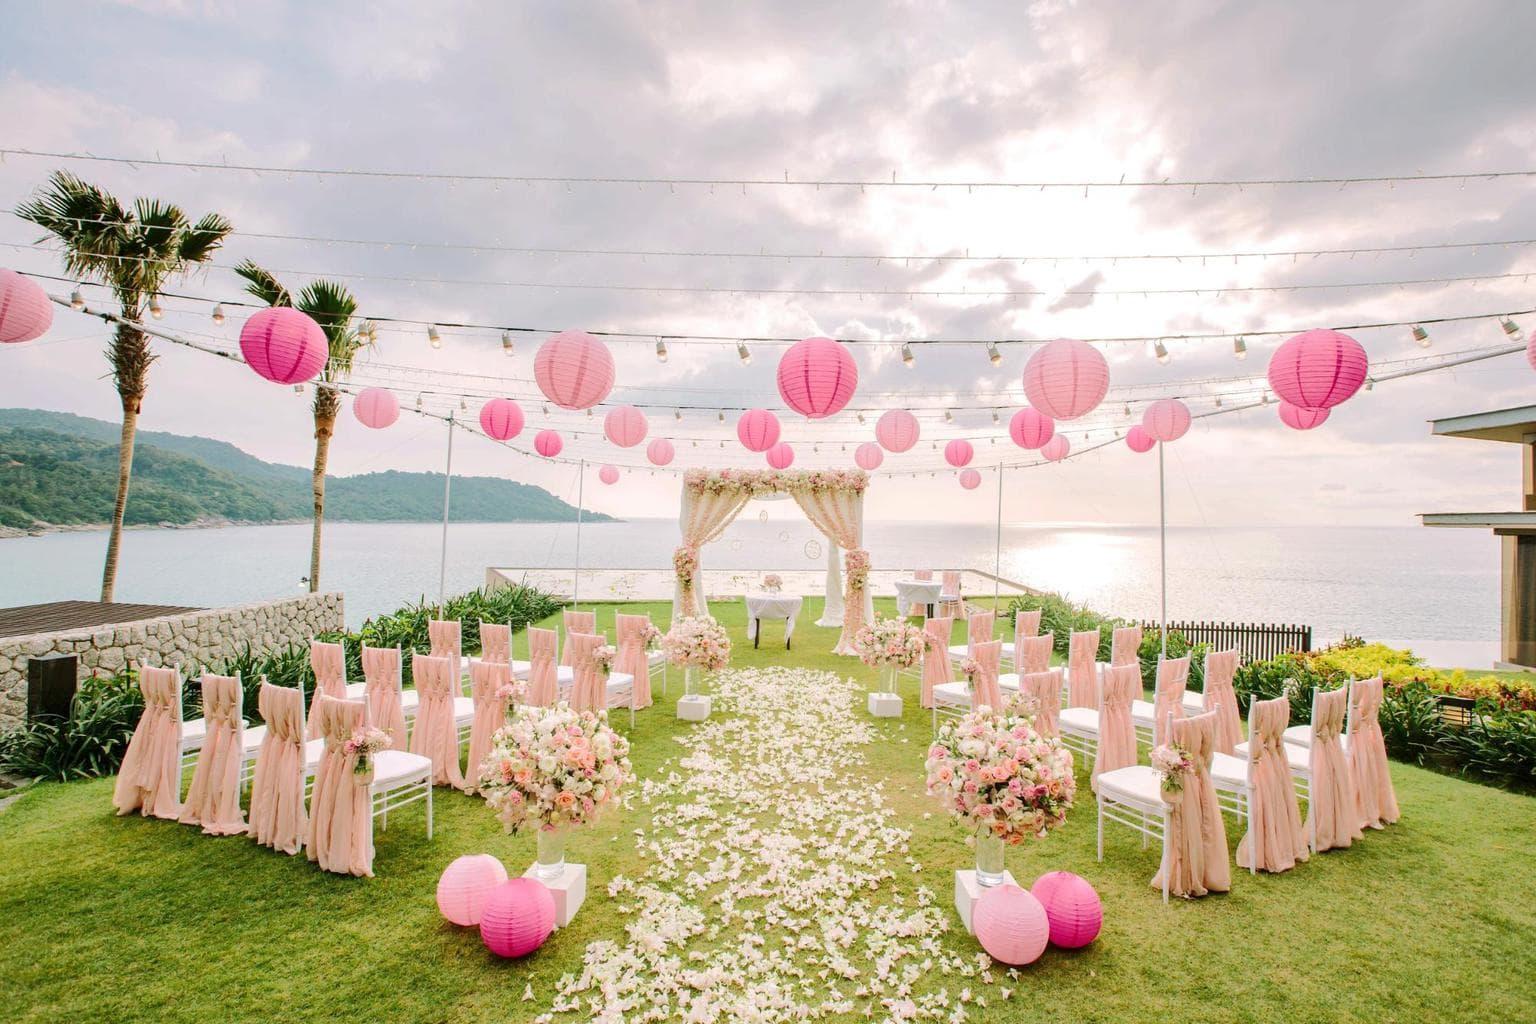 Have a destination wedding at one of the best Phuket luxury villa